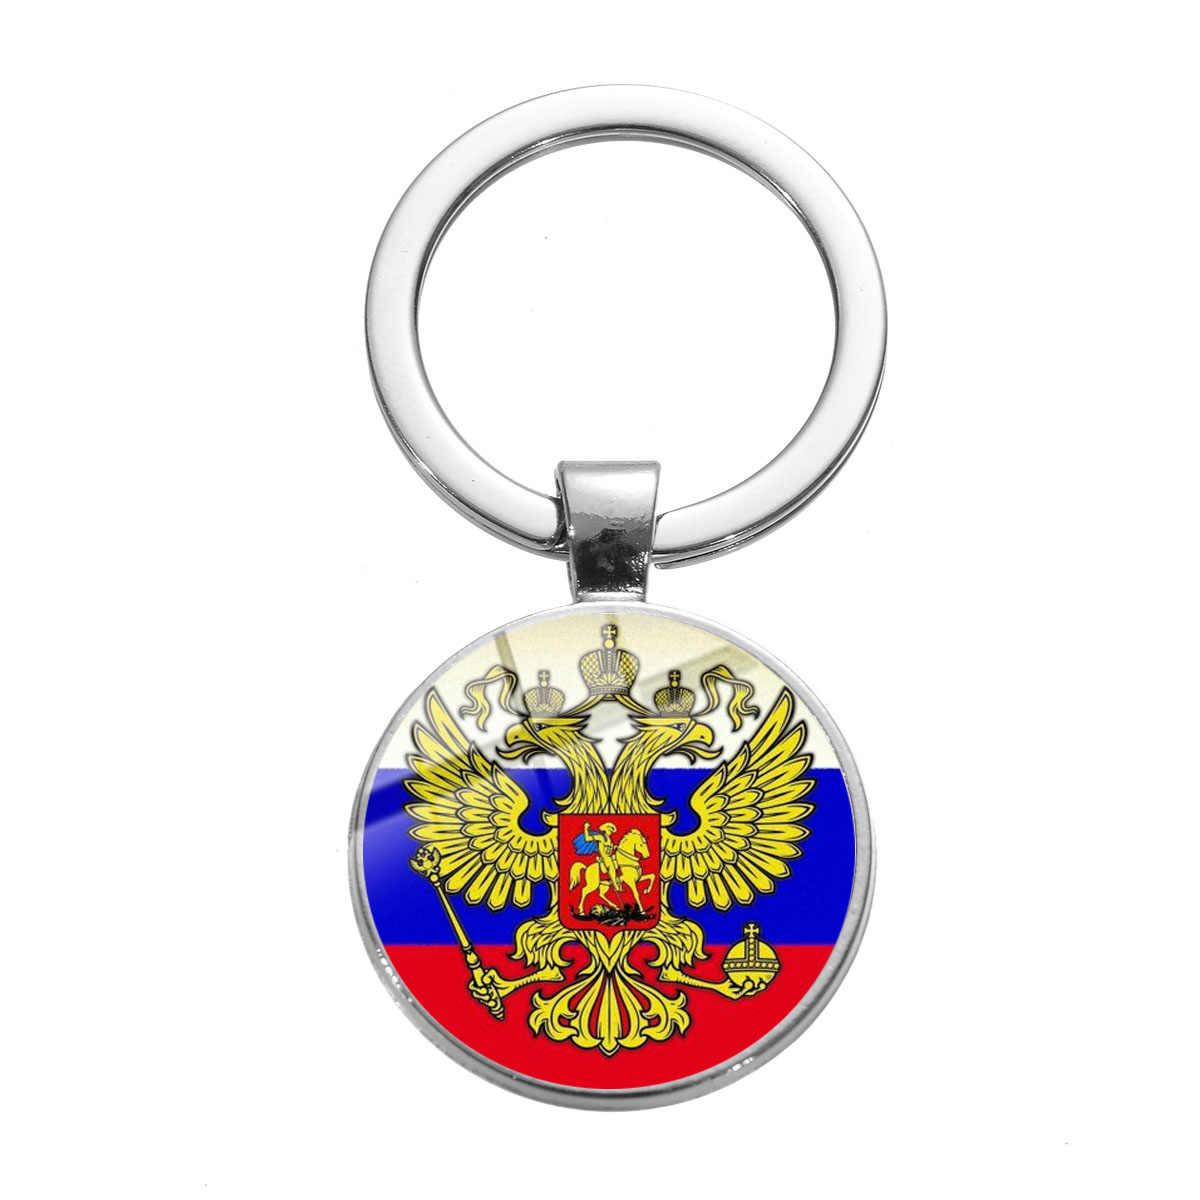 Uni Soviet Soviet Lencana Gantungan Kunci Sabit Hammer Pro Kitty Rusia Lambang Komunisme Simbol Kualitas Tinggi Perak Berlapis Kaca Gantungan Kunci